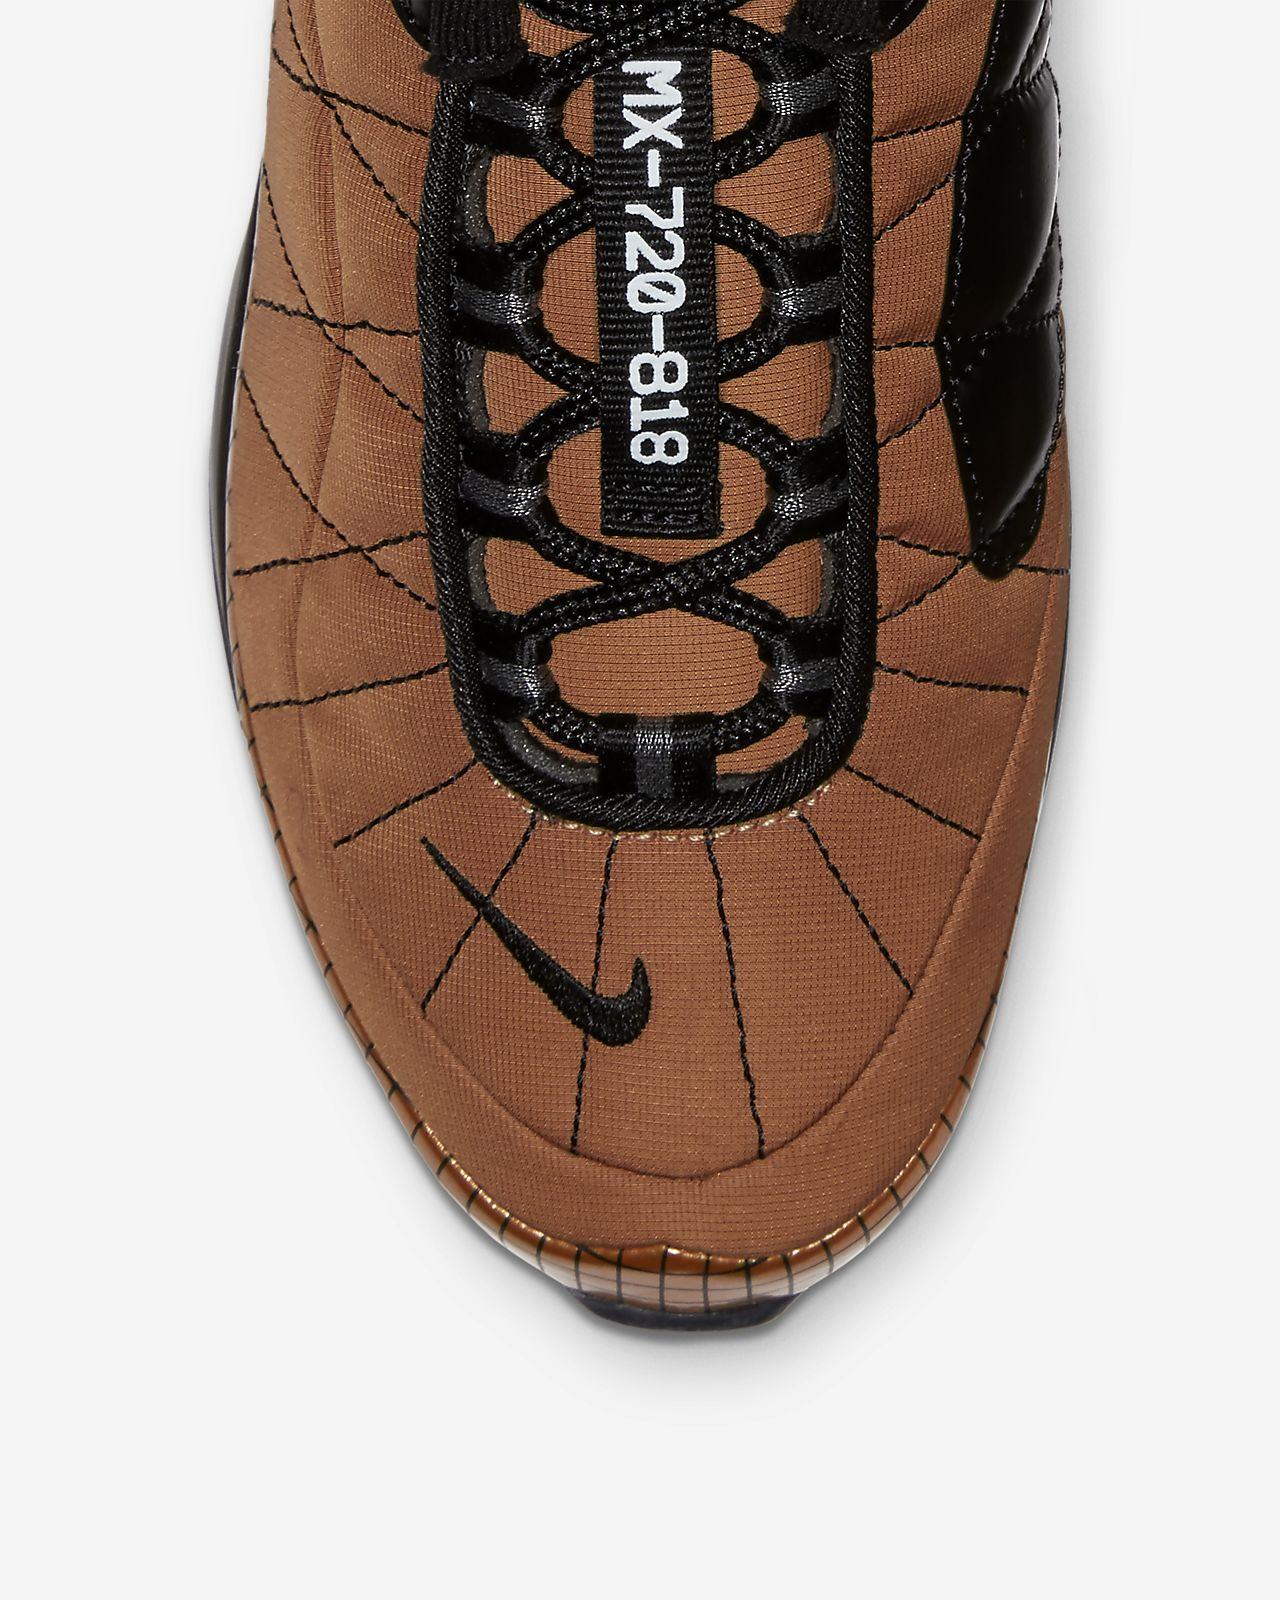 Nike MX 720 818 Damenschuh